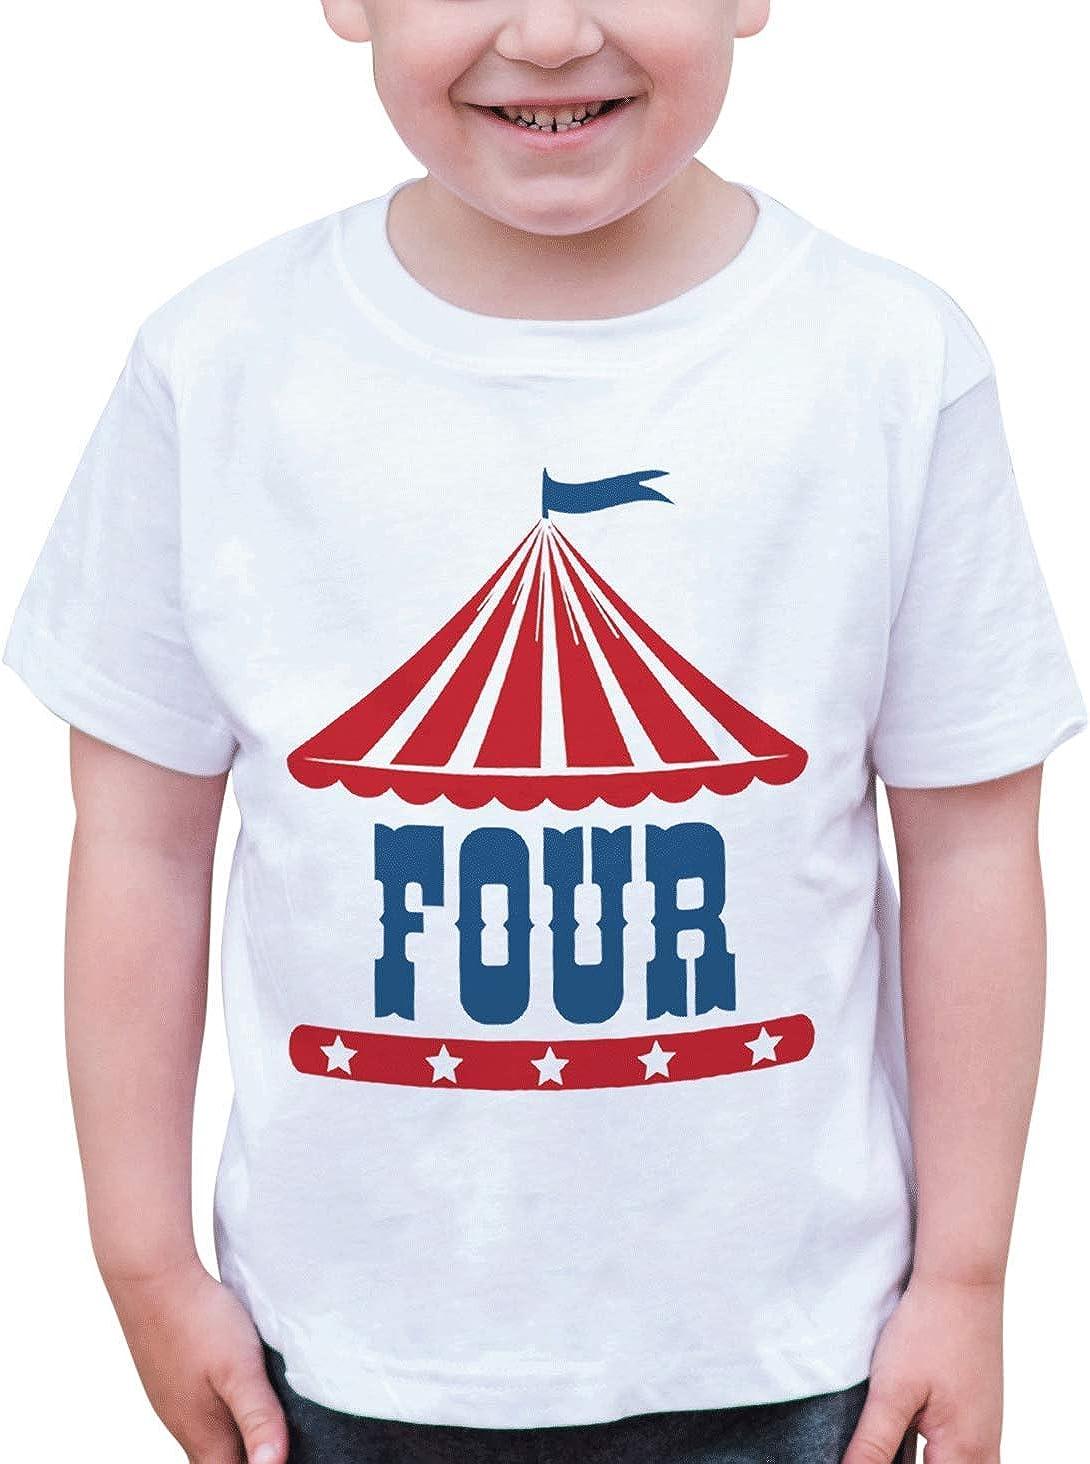 7 ate 9 Apparel Boys Birthday Four Circus T-Shirt